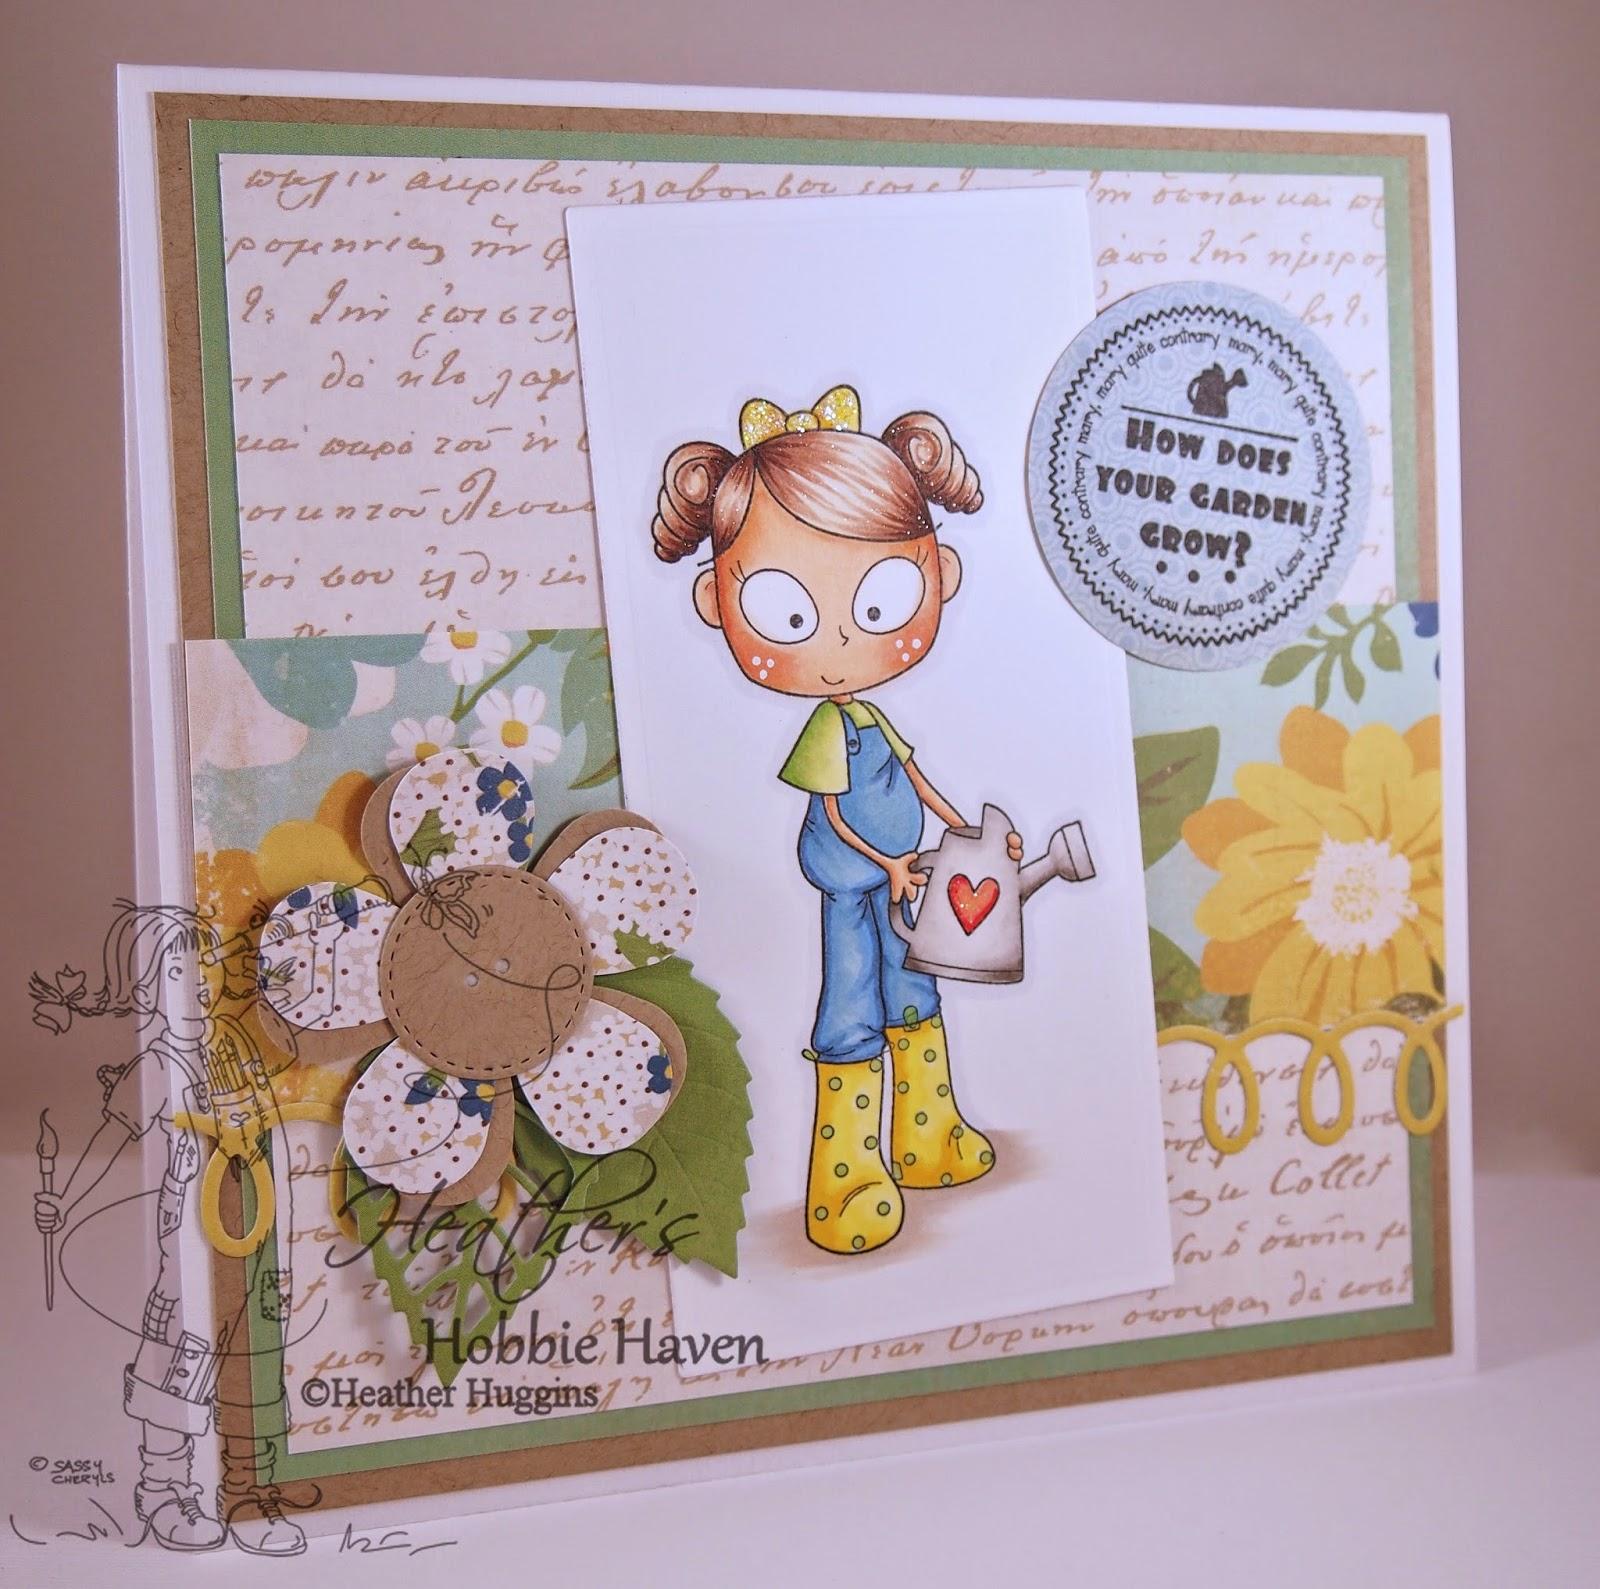 Heather's Hobbie Haven - Garden Card Kit